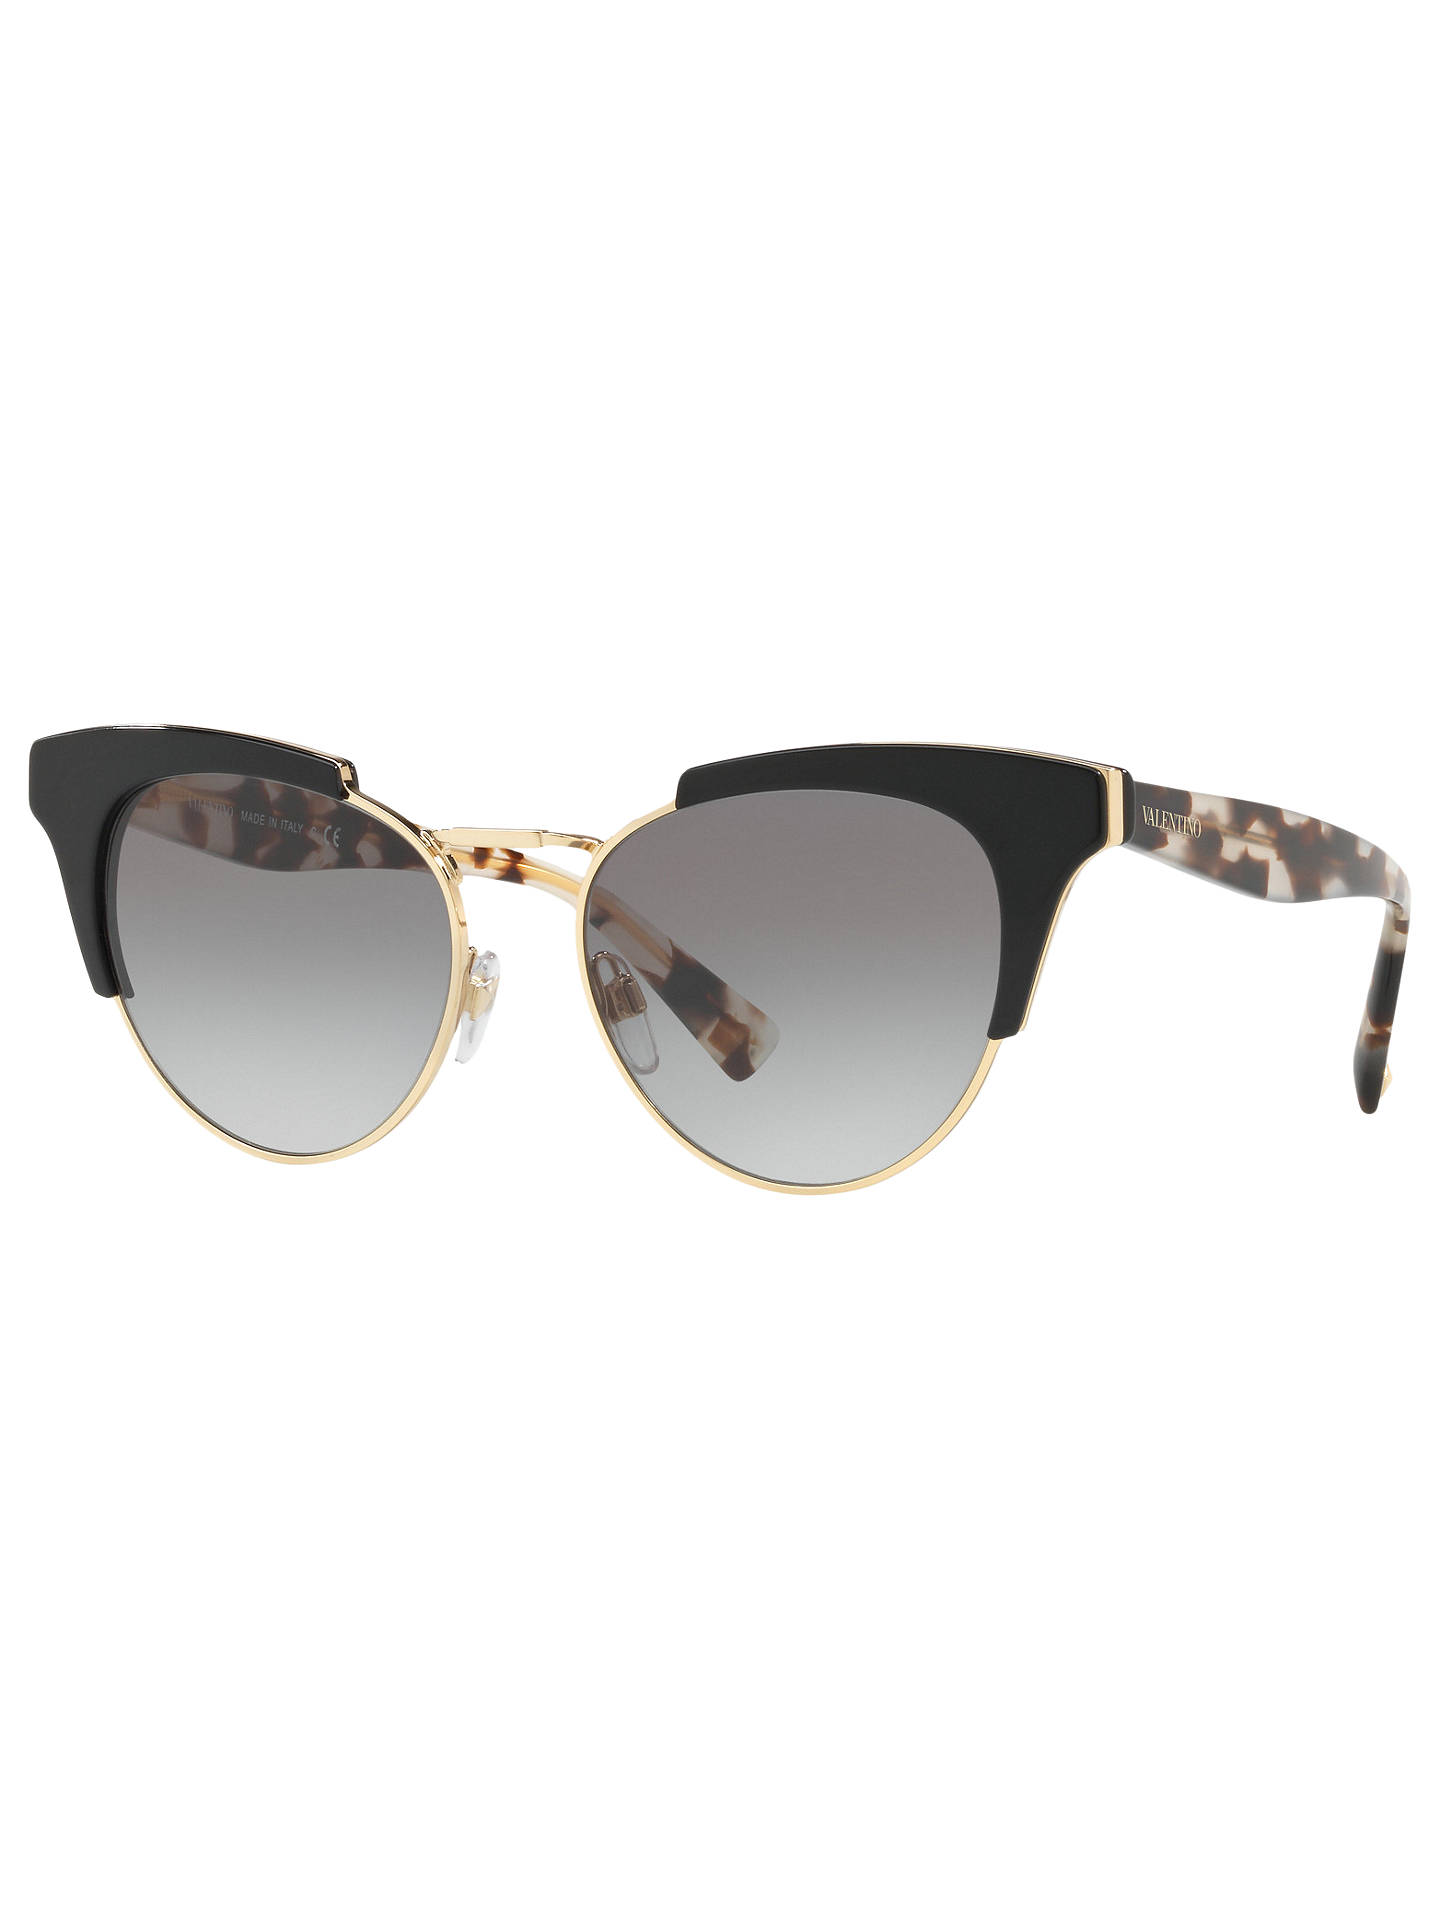 9b631fd256db0 Buy Valentino VA4026 Cat's Eye Sunglasses, Black/Grey Gradient Online at  johnlewis. ...